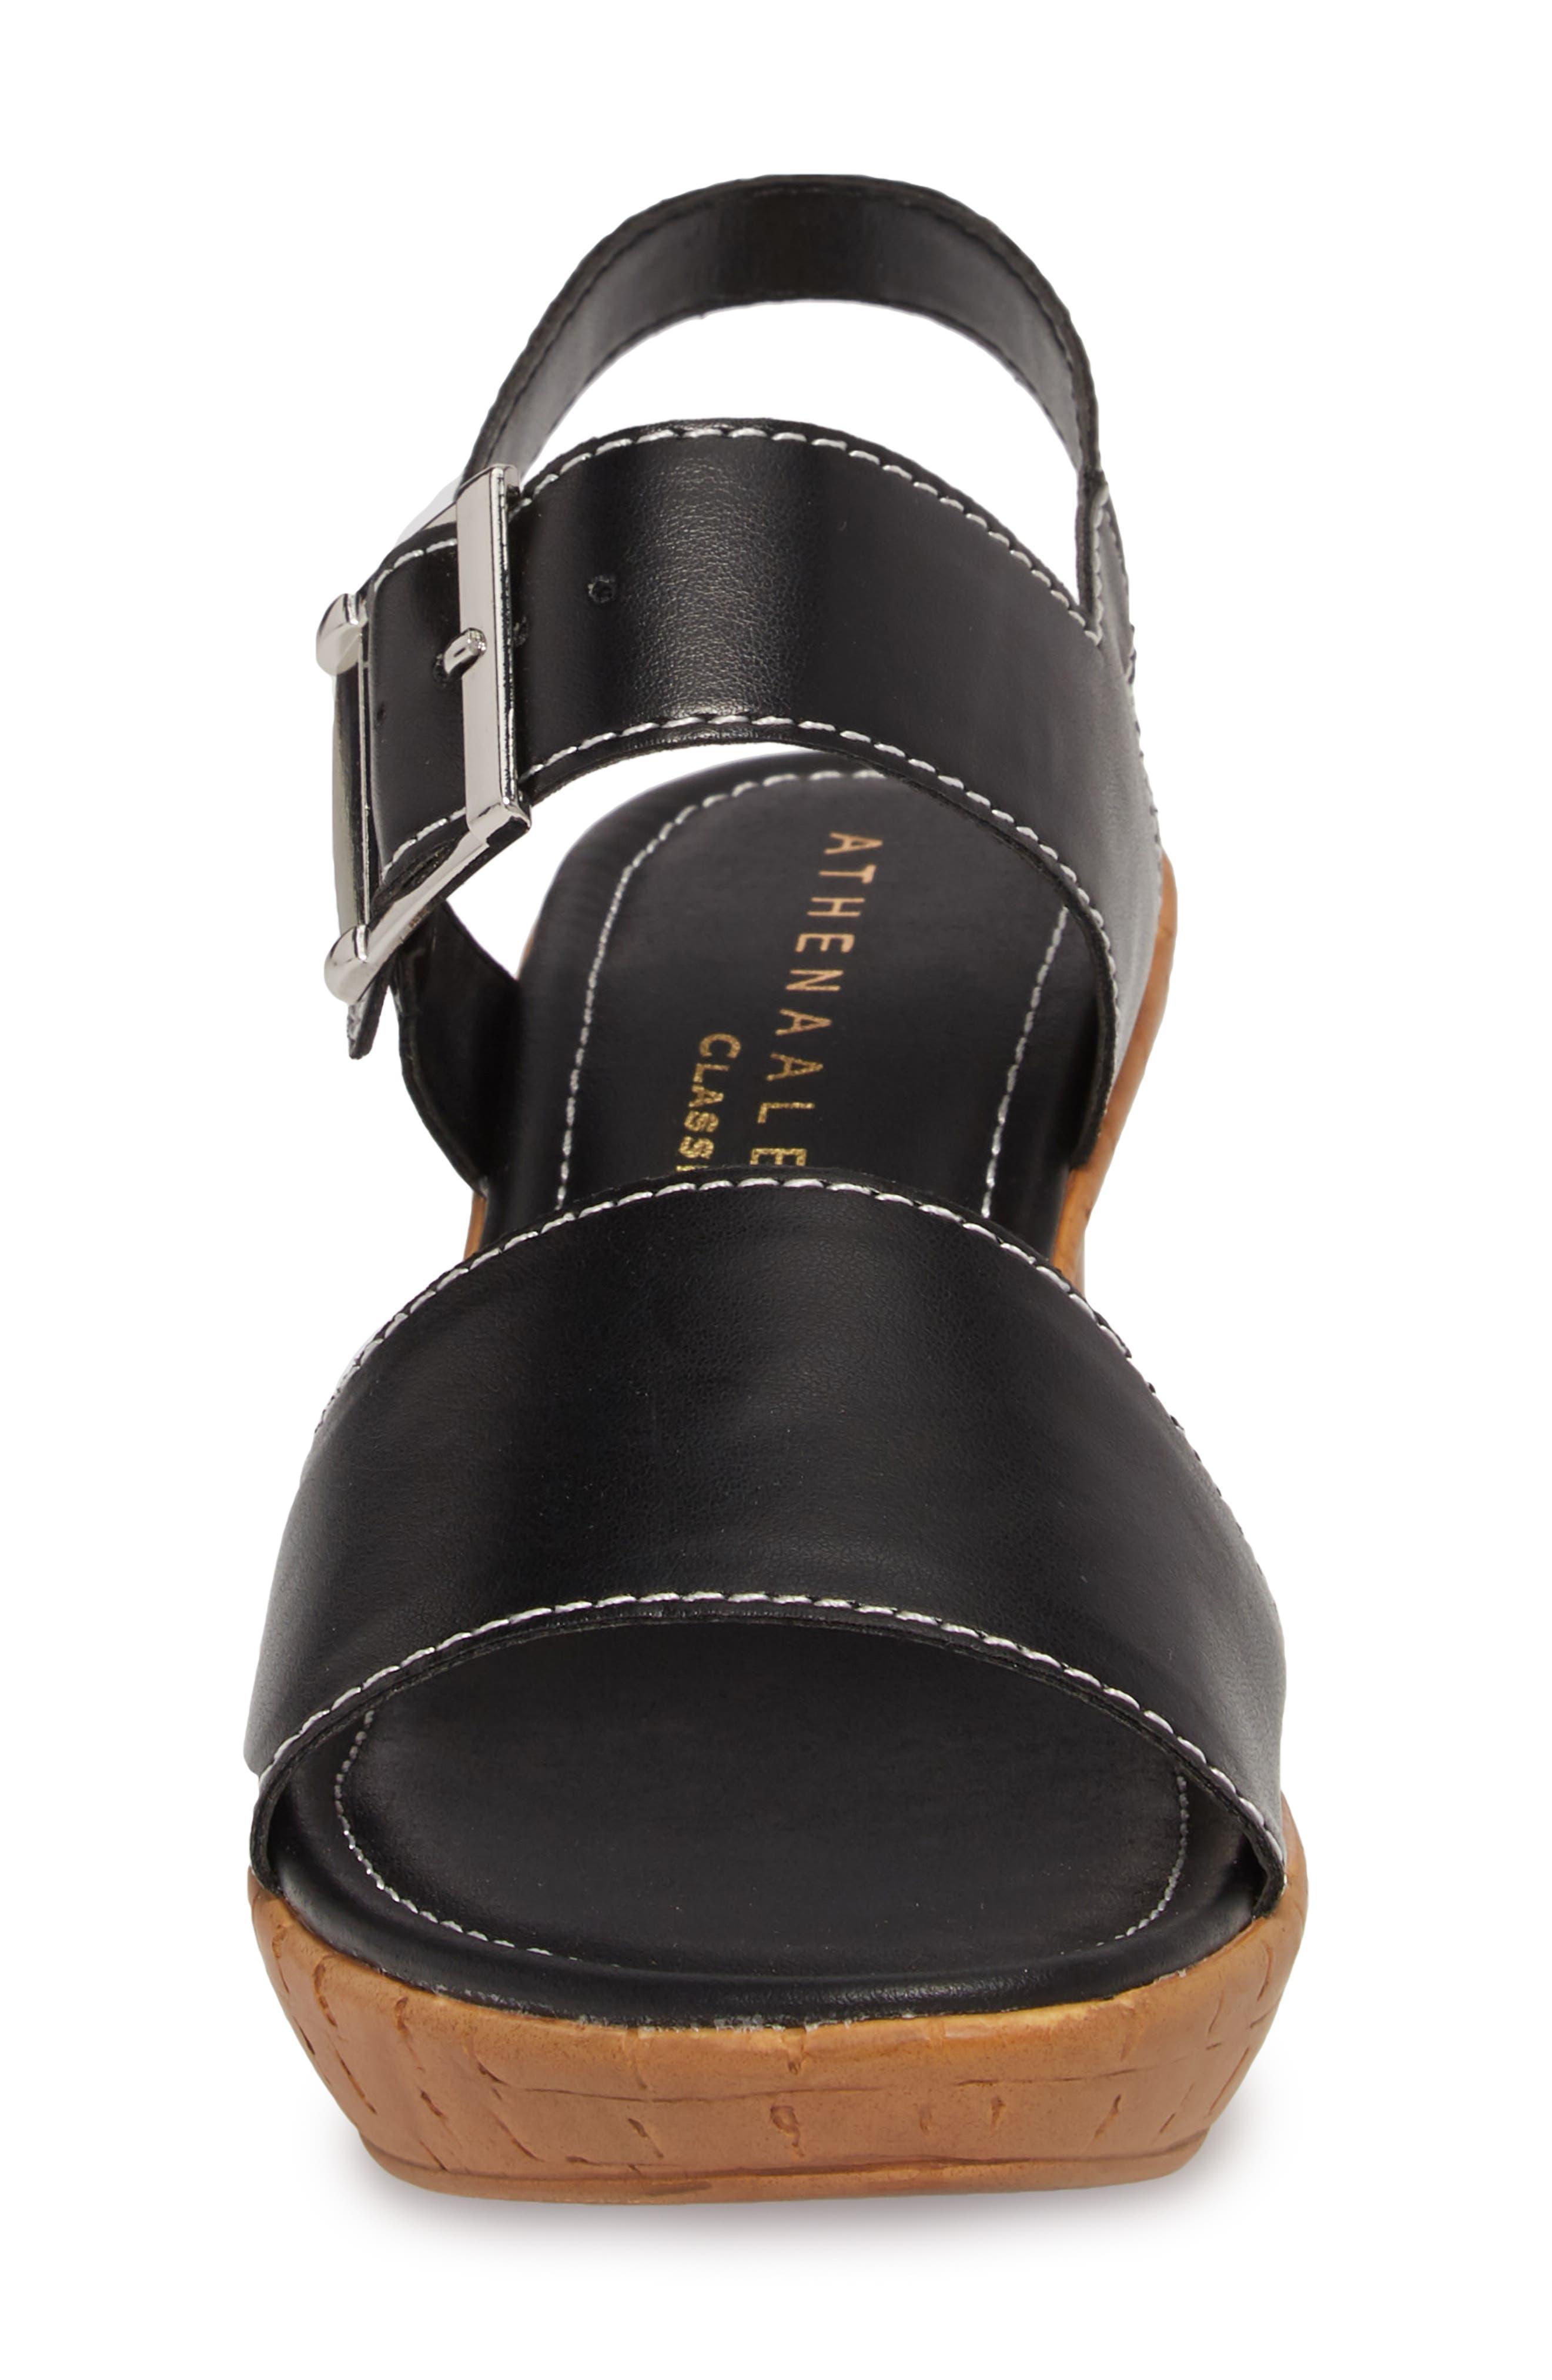 Shelter Platform Wedge Sandal,                             Alternate thumbnail 4, color,                             BLACK FAUX LEATHER